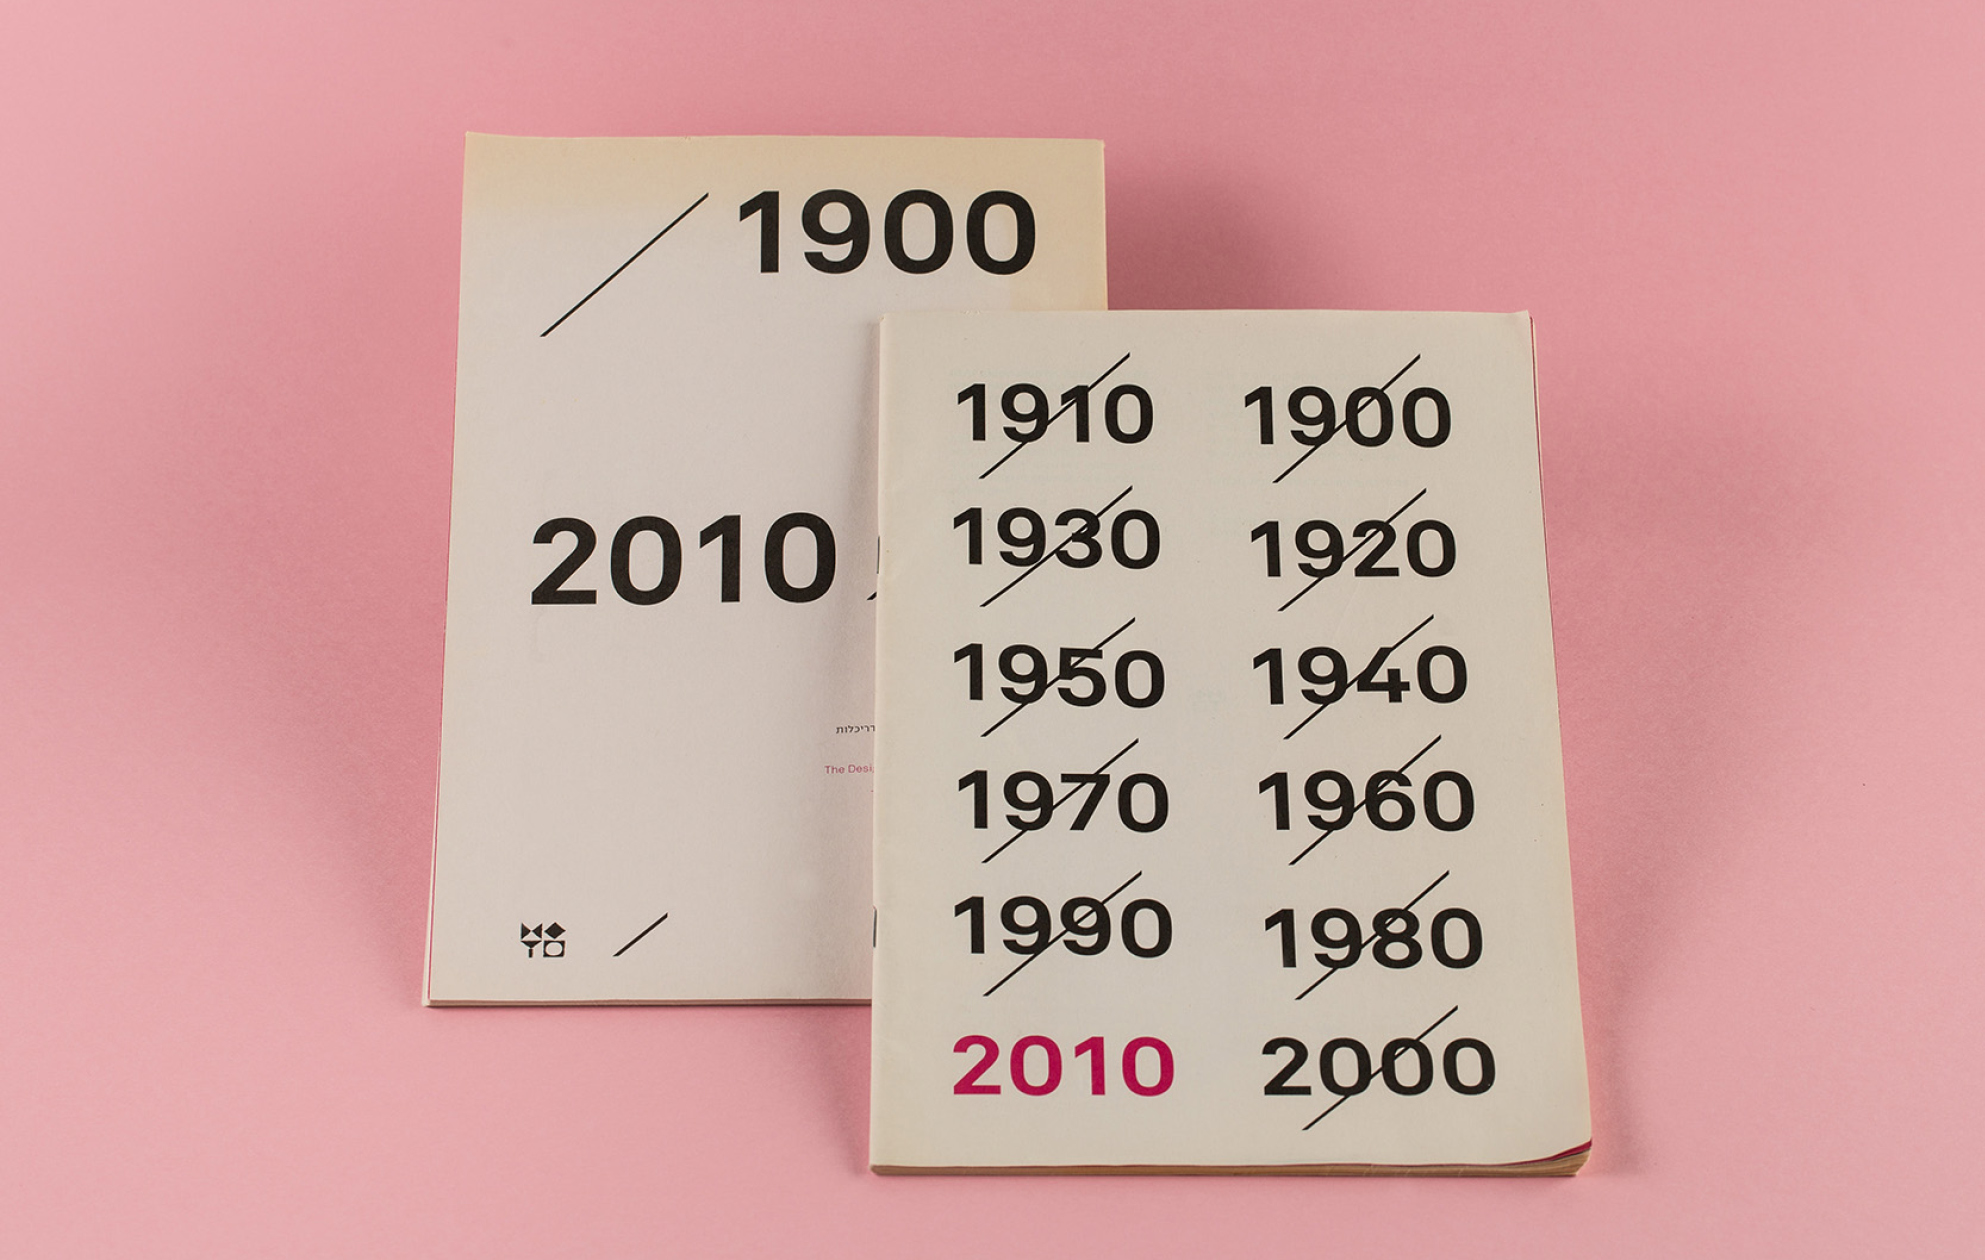 1920 - 2010